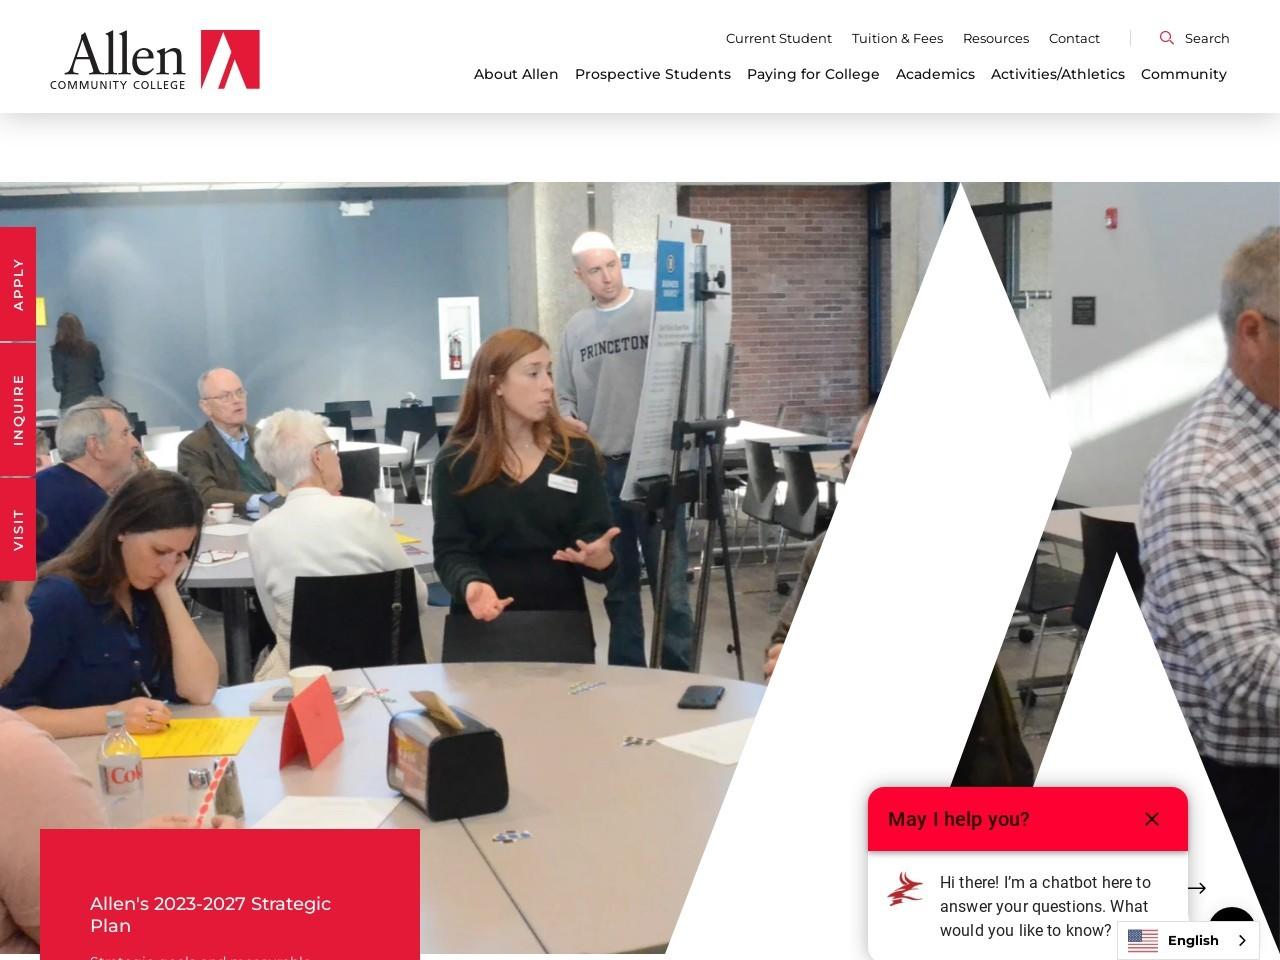 allencc.edu